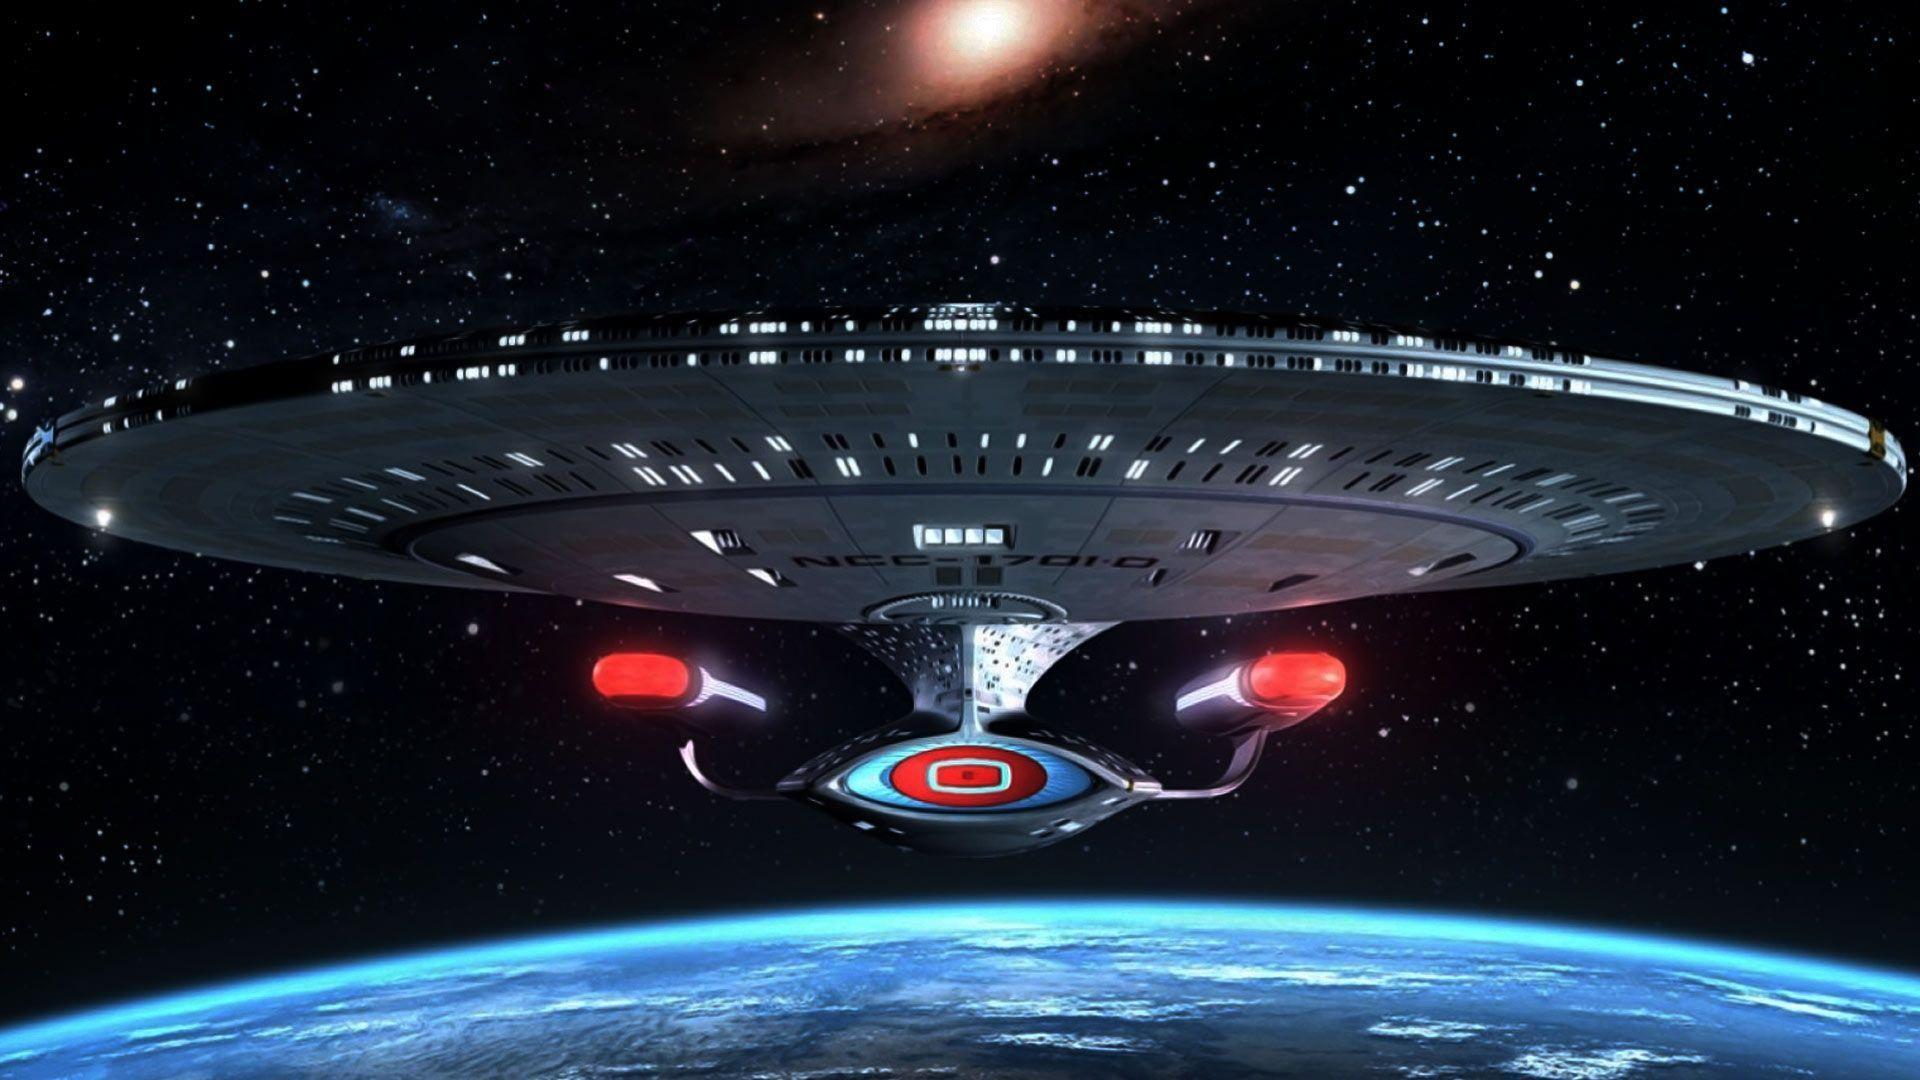 Star Trek Enterprice